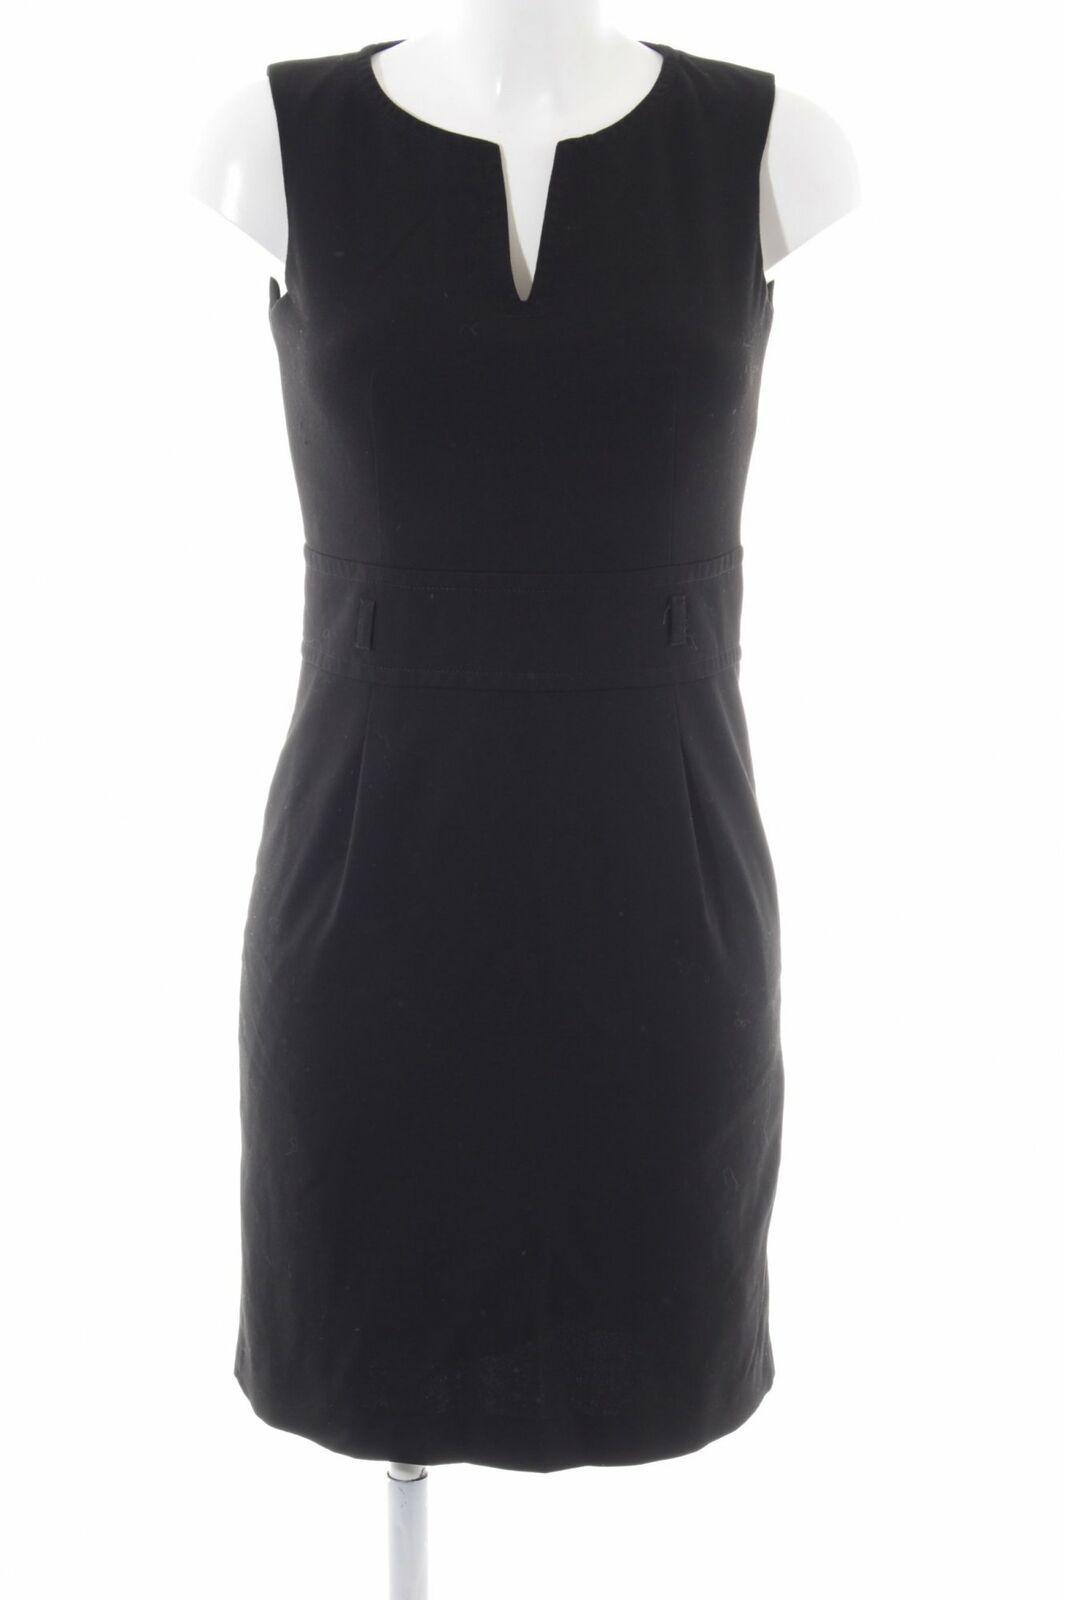 MEXX Etuikleid schwarz Business-Look Damen Gr. DE 20 Kleid Dress